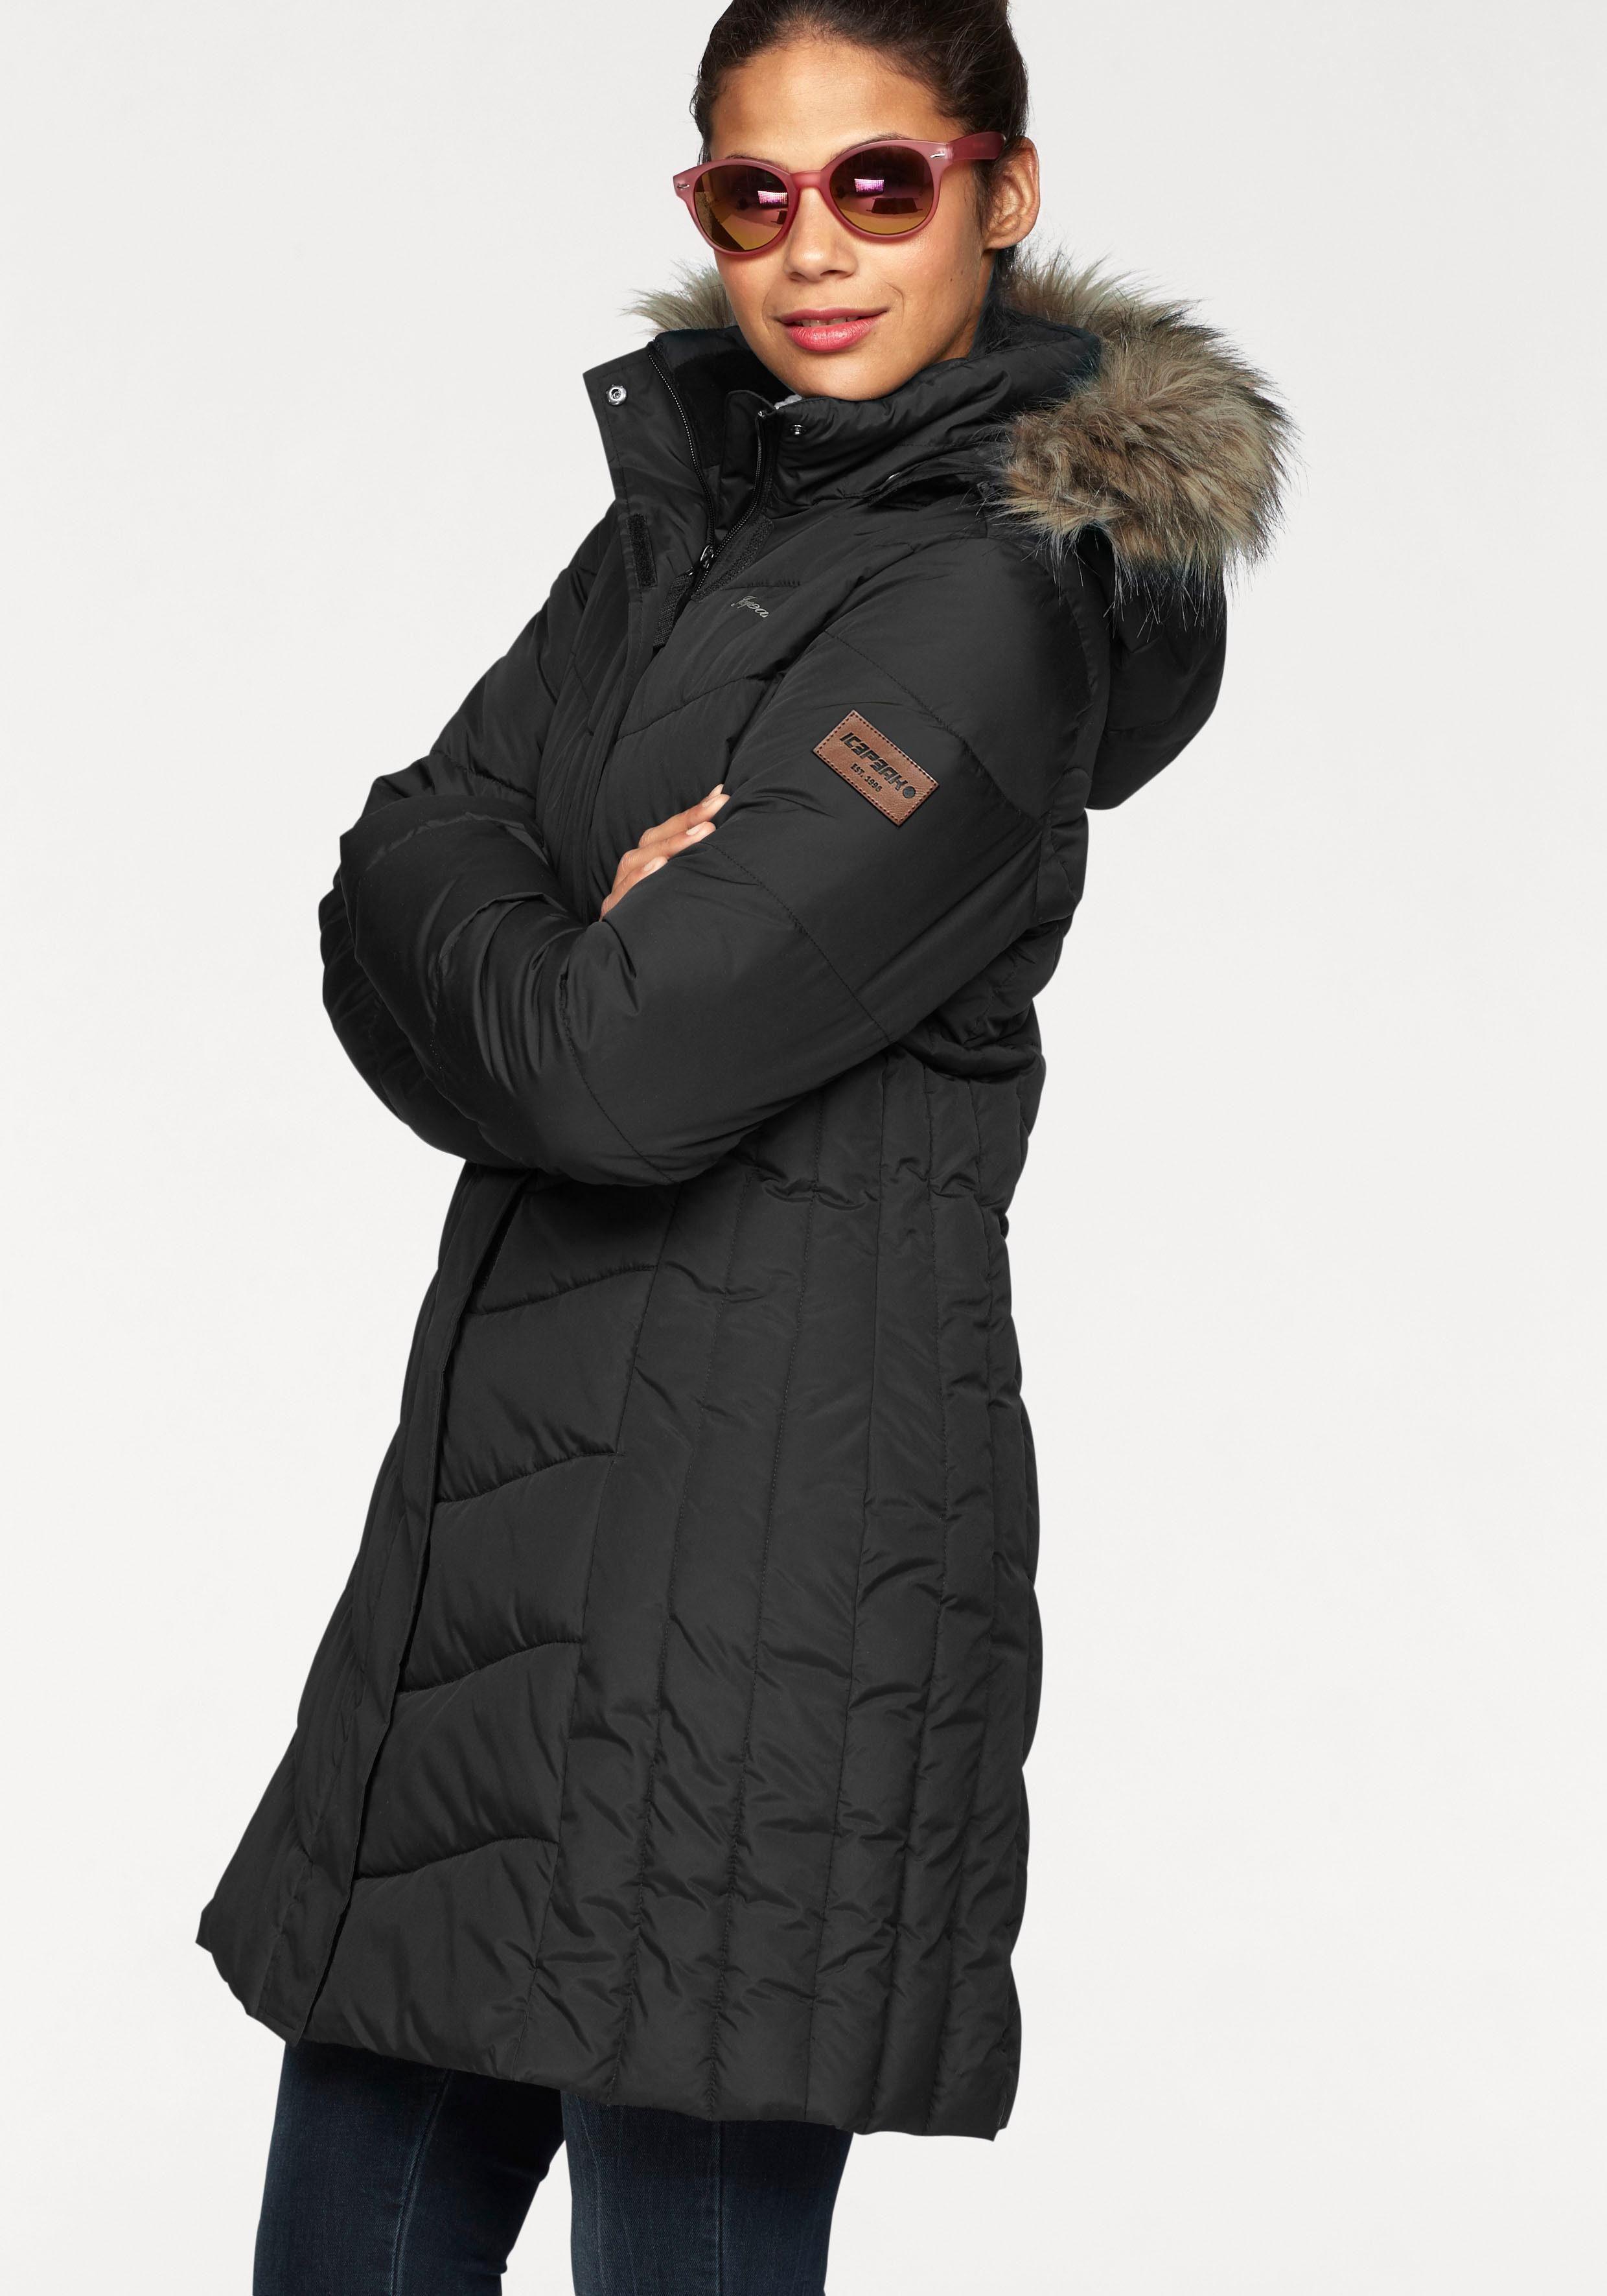 Icepeak gewatteerde jas »AVERY« in de online winkel | OTTO